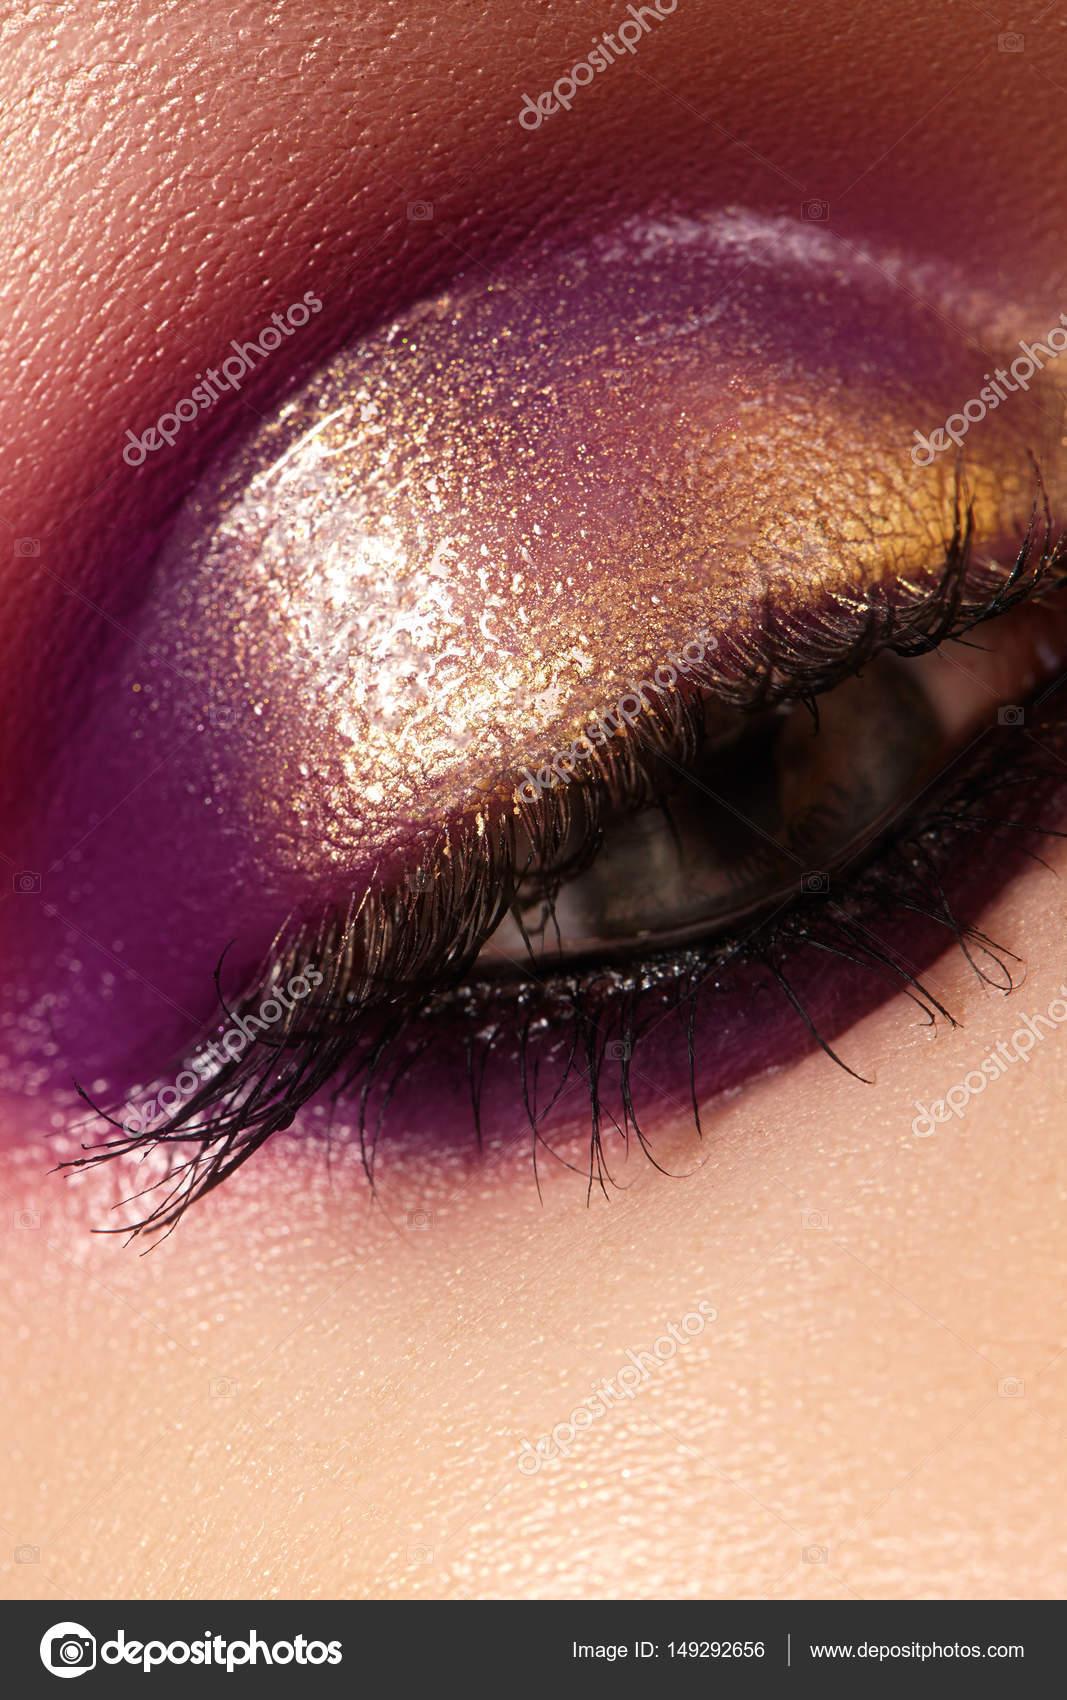 dress - Makeup eye purple close up photo video